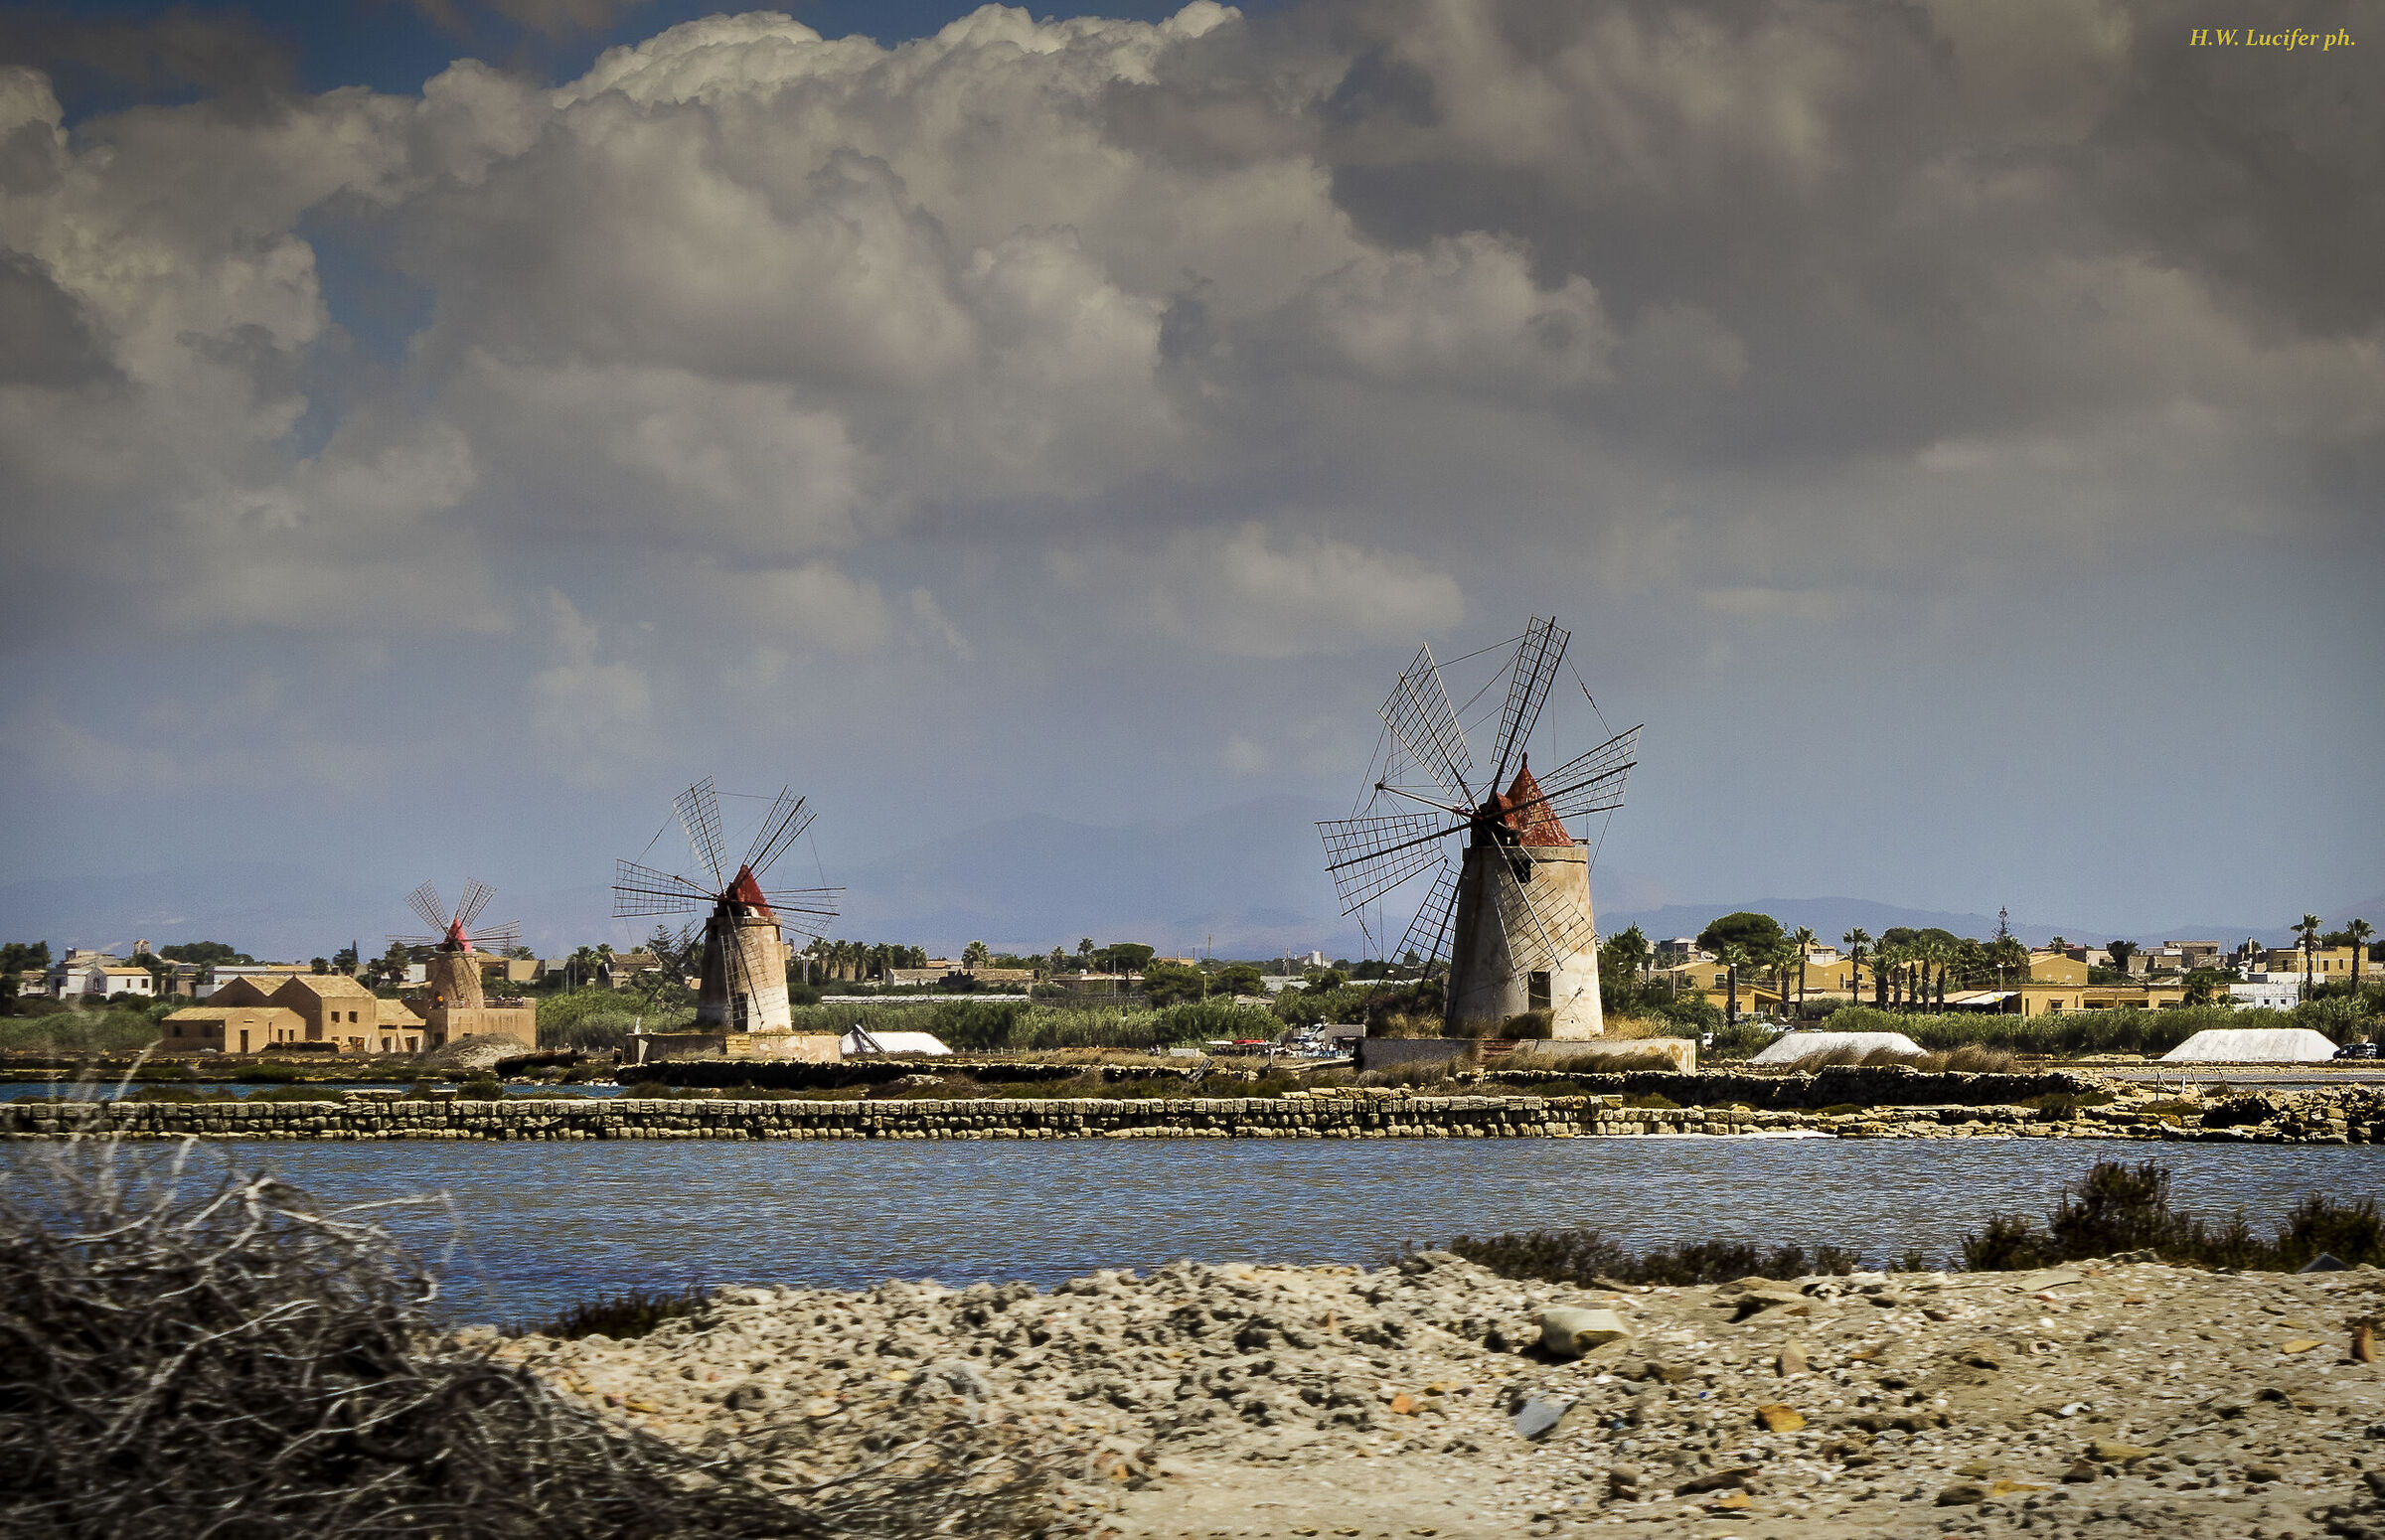 The mills of the Salt Pans of Marsala...